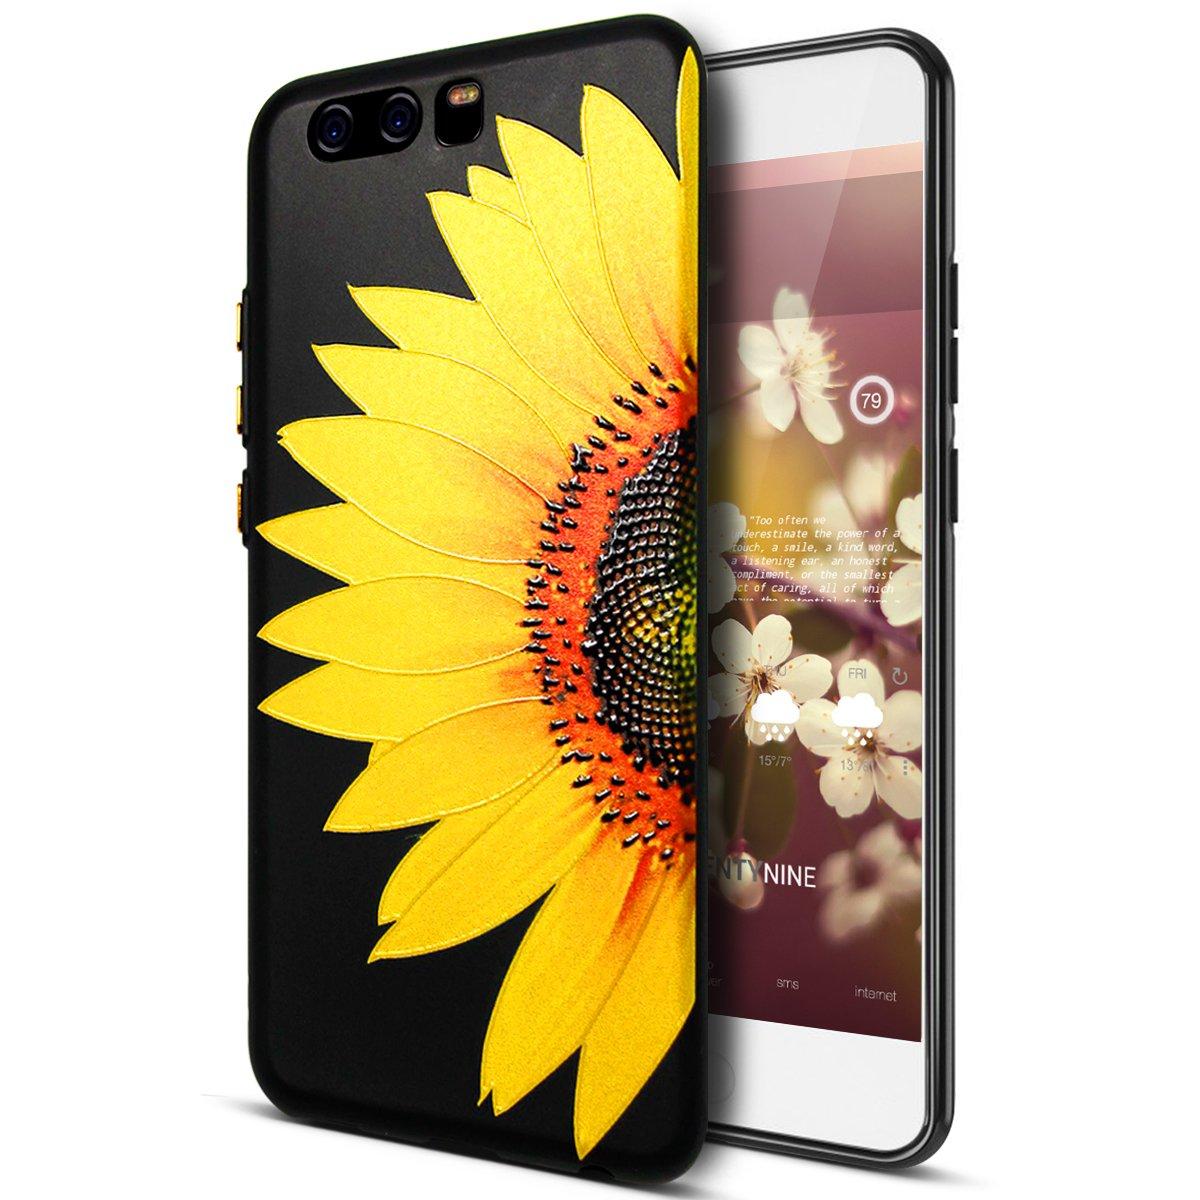 Huawei P10Plus caso, Huawei P10Plus TPU caso, ikasus 3d relief relieve colorido arte pintado patrón de flores de girasol de cerezo negro Flexible suave silicona TPU parachoques de goma protectora funda para Huawei P10Plus,